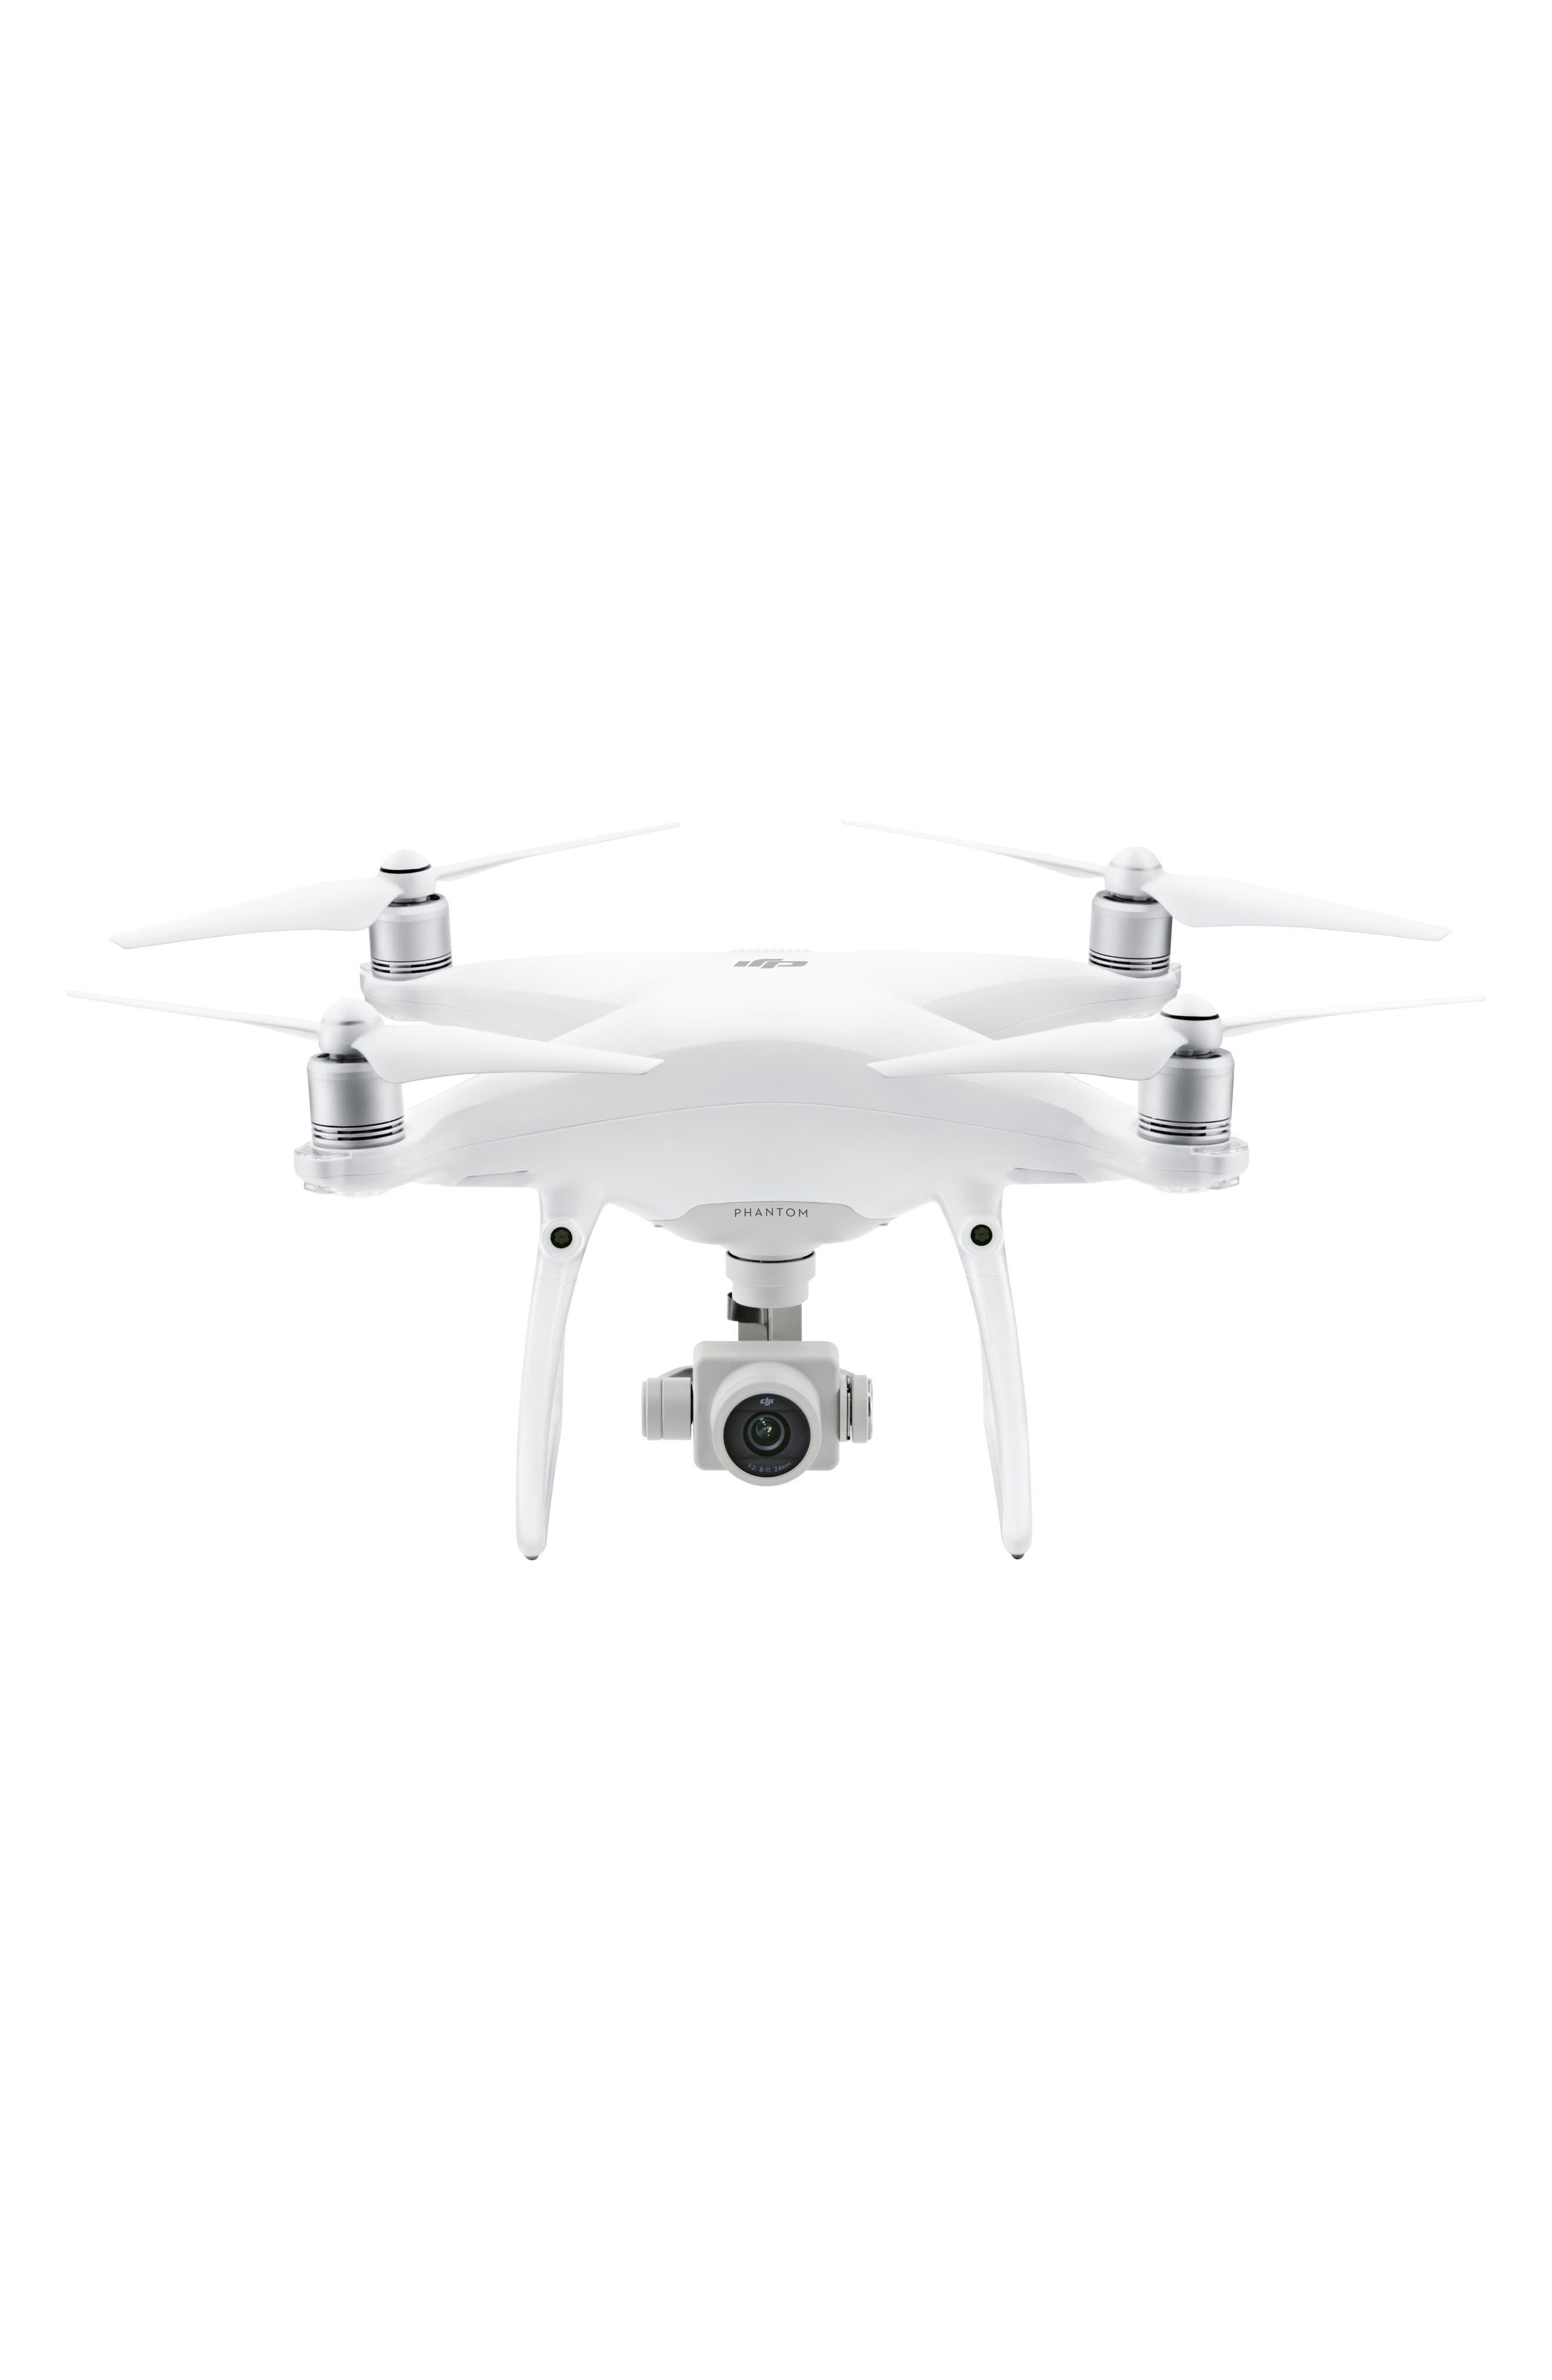 DJI Phantom 4 Advanced Flying Quadcopter with 2.7K Camera and 3 Axis Gimbal